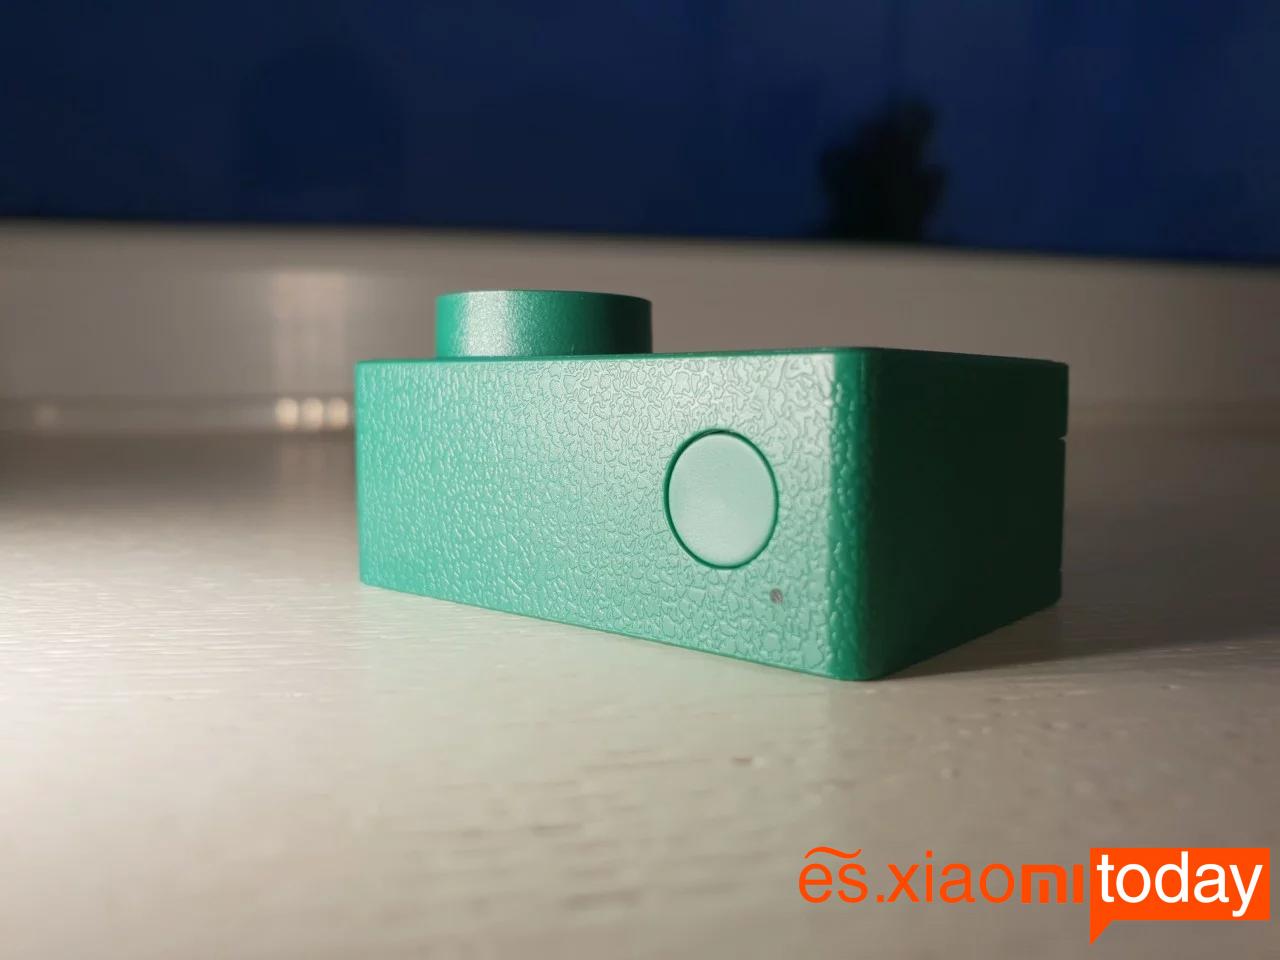 Xiaomi Seabird 4K Action Camera Análisis: Diseño